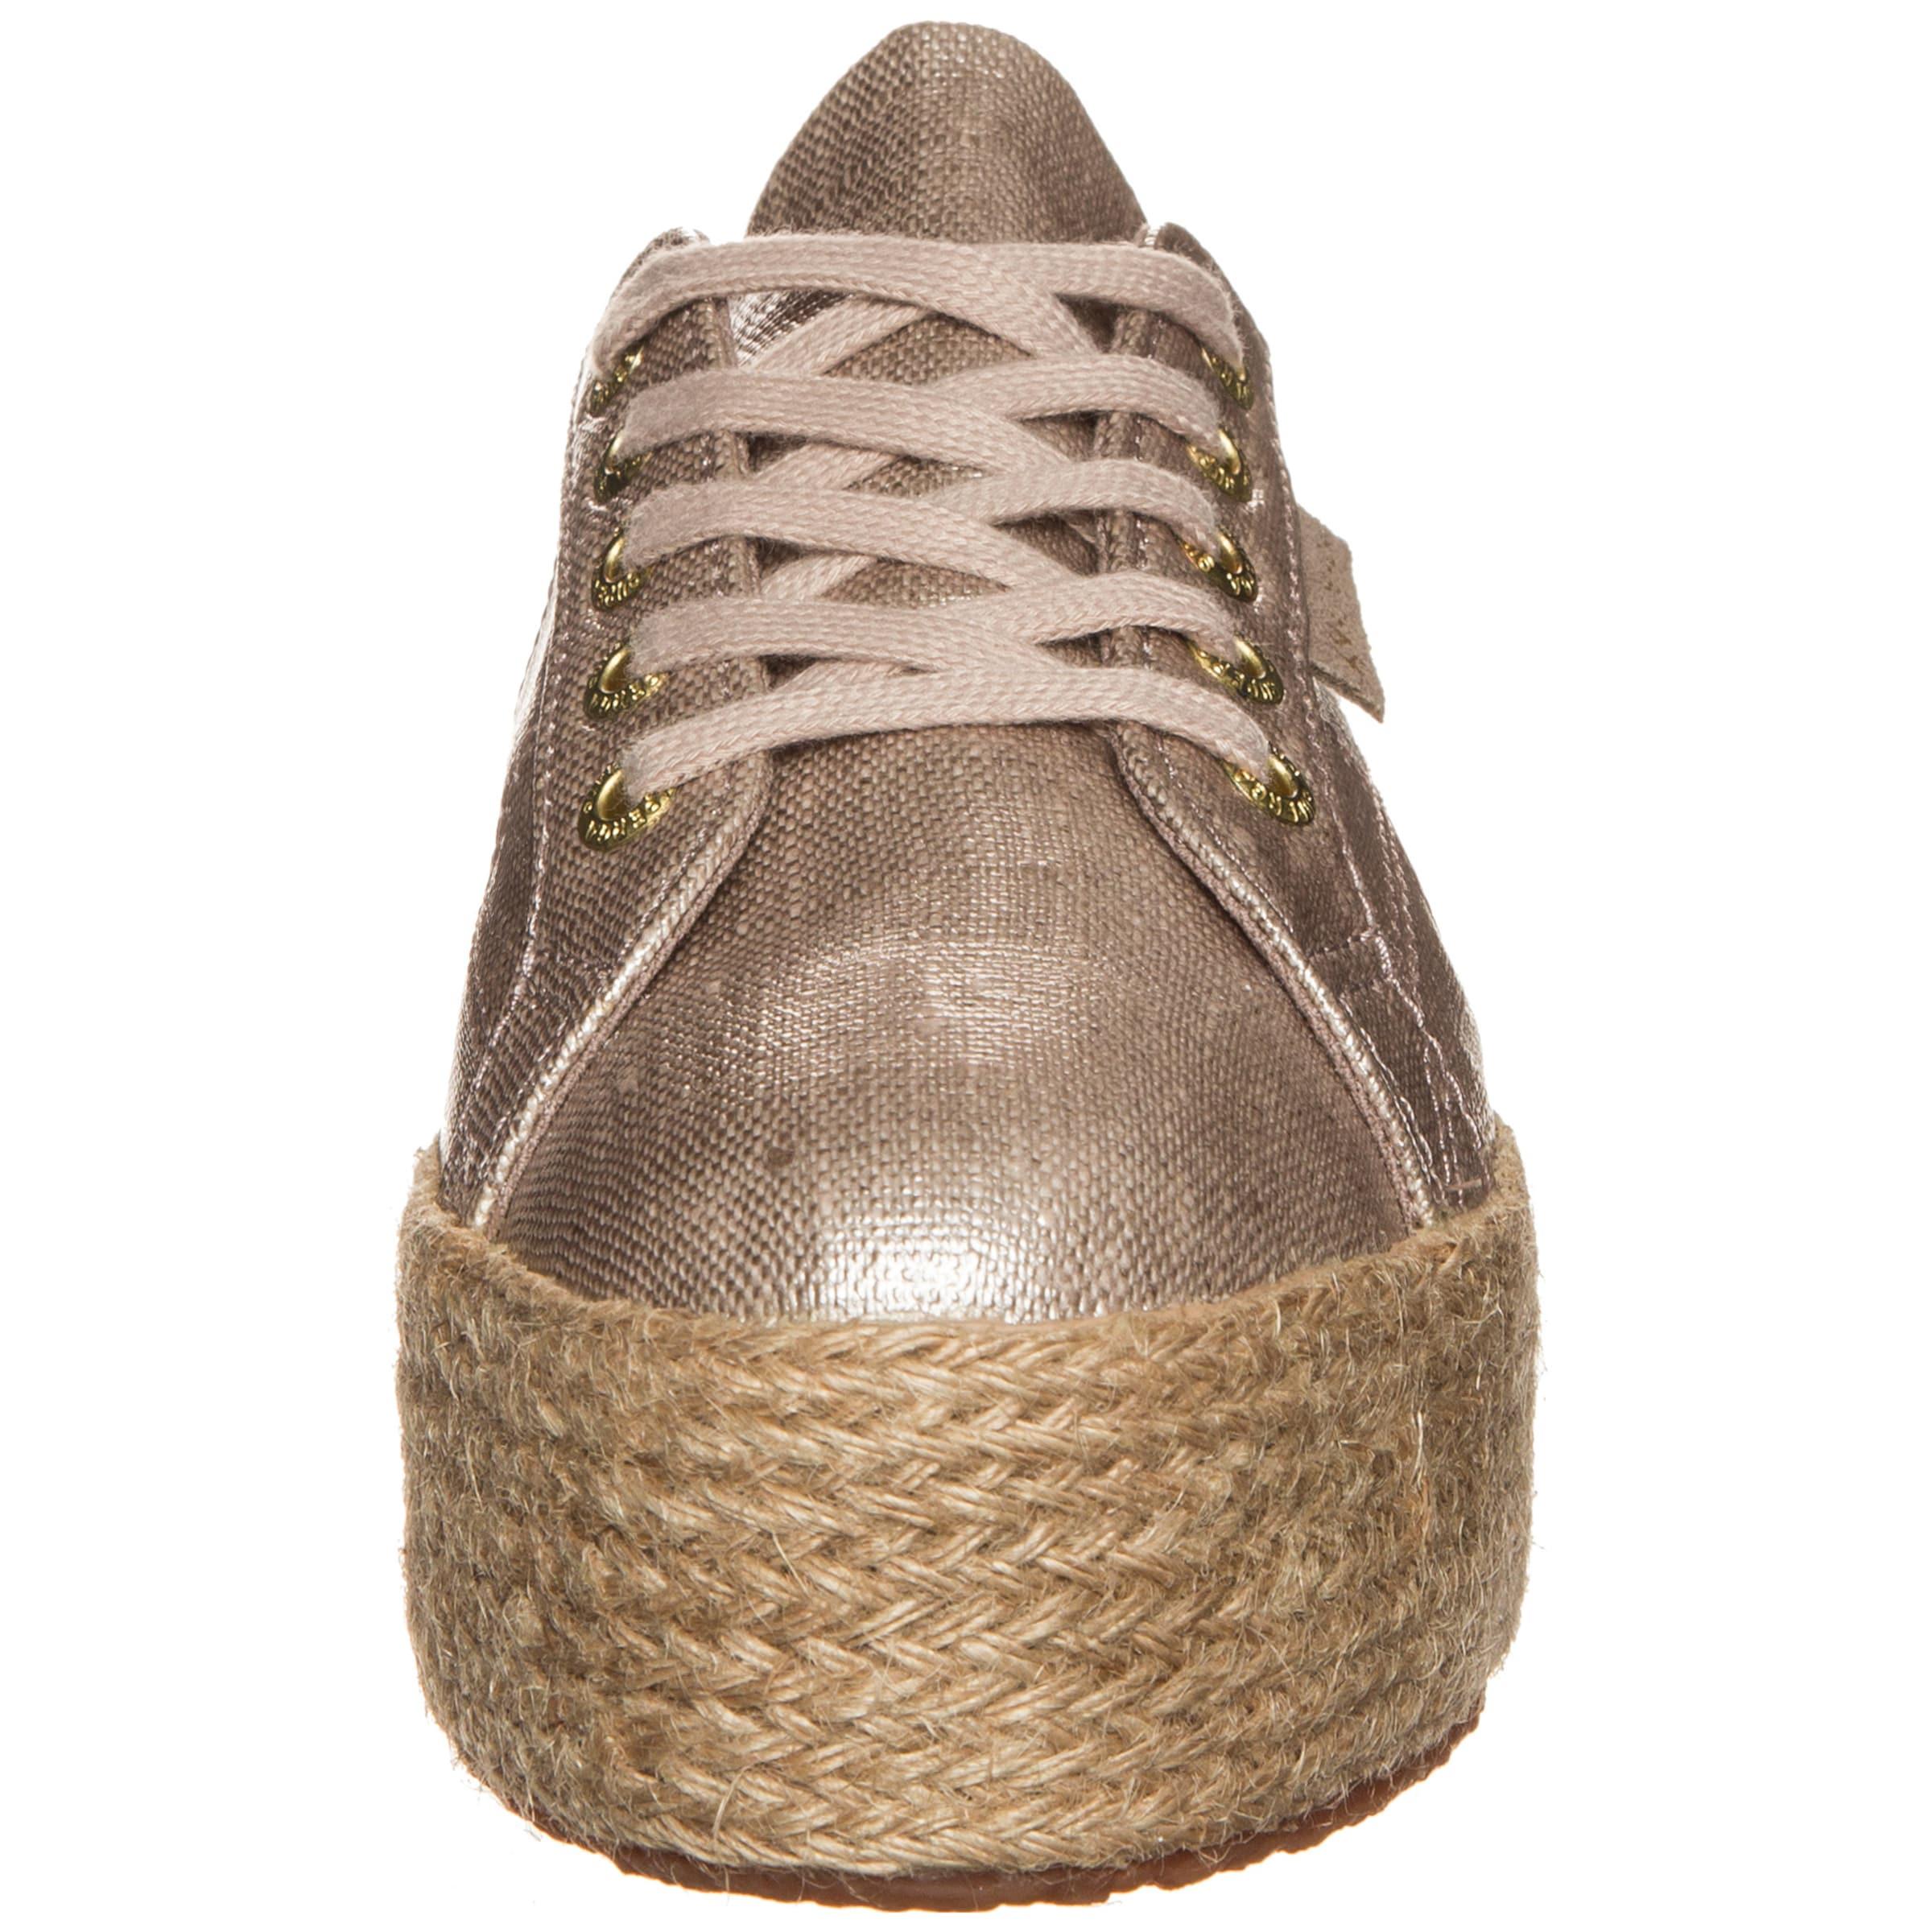 '2790 Braun In Superga Linrbrropew' Sneaker YbWEeH2D9I